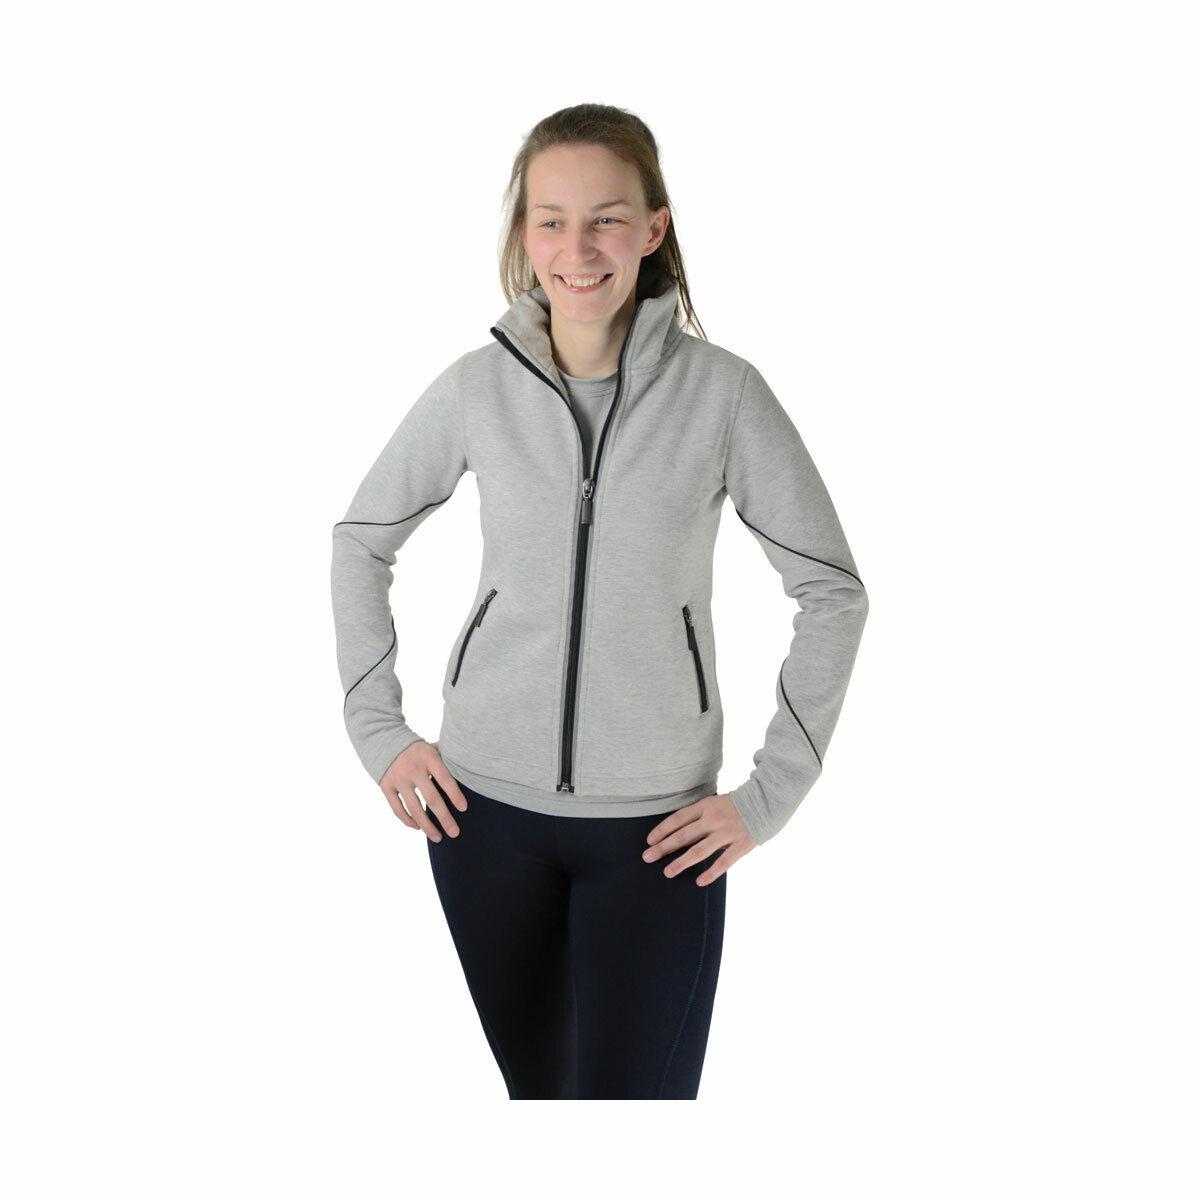 HyFASHION London Edition Sports Fleece Reflective Light Grey Neon Peach XS-XL